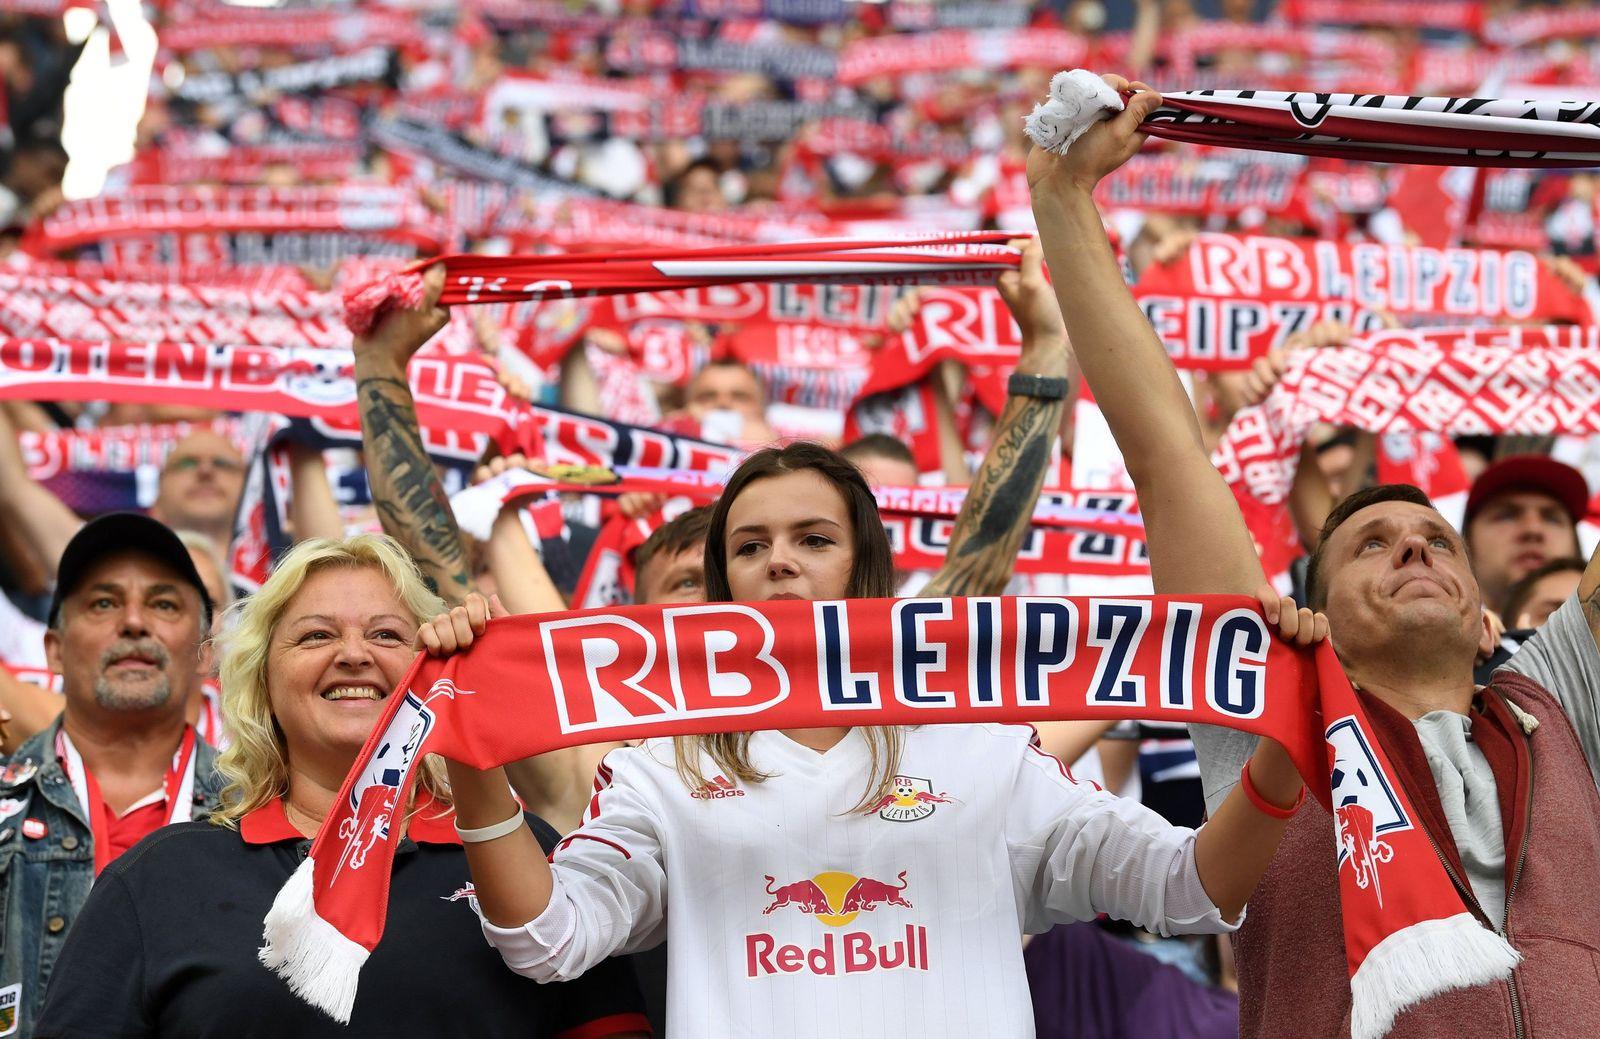 RB Leipzig - Stoke City